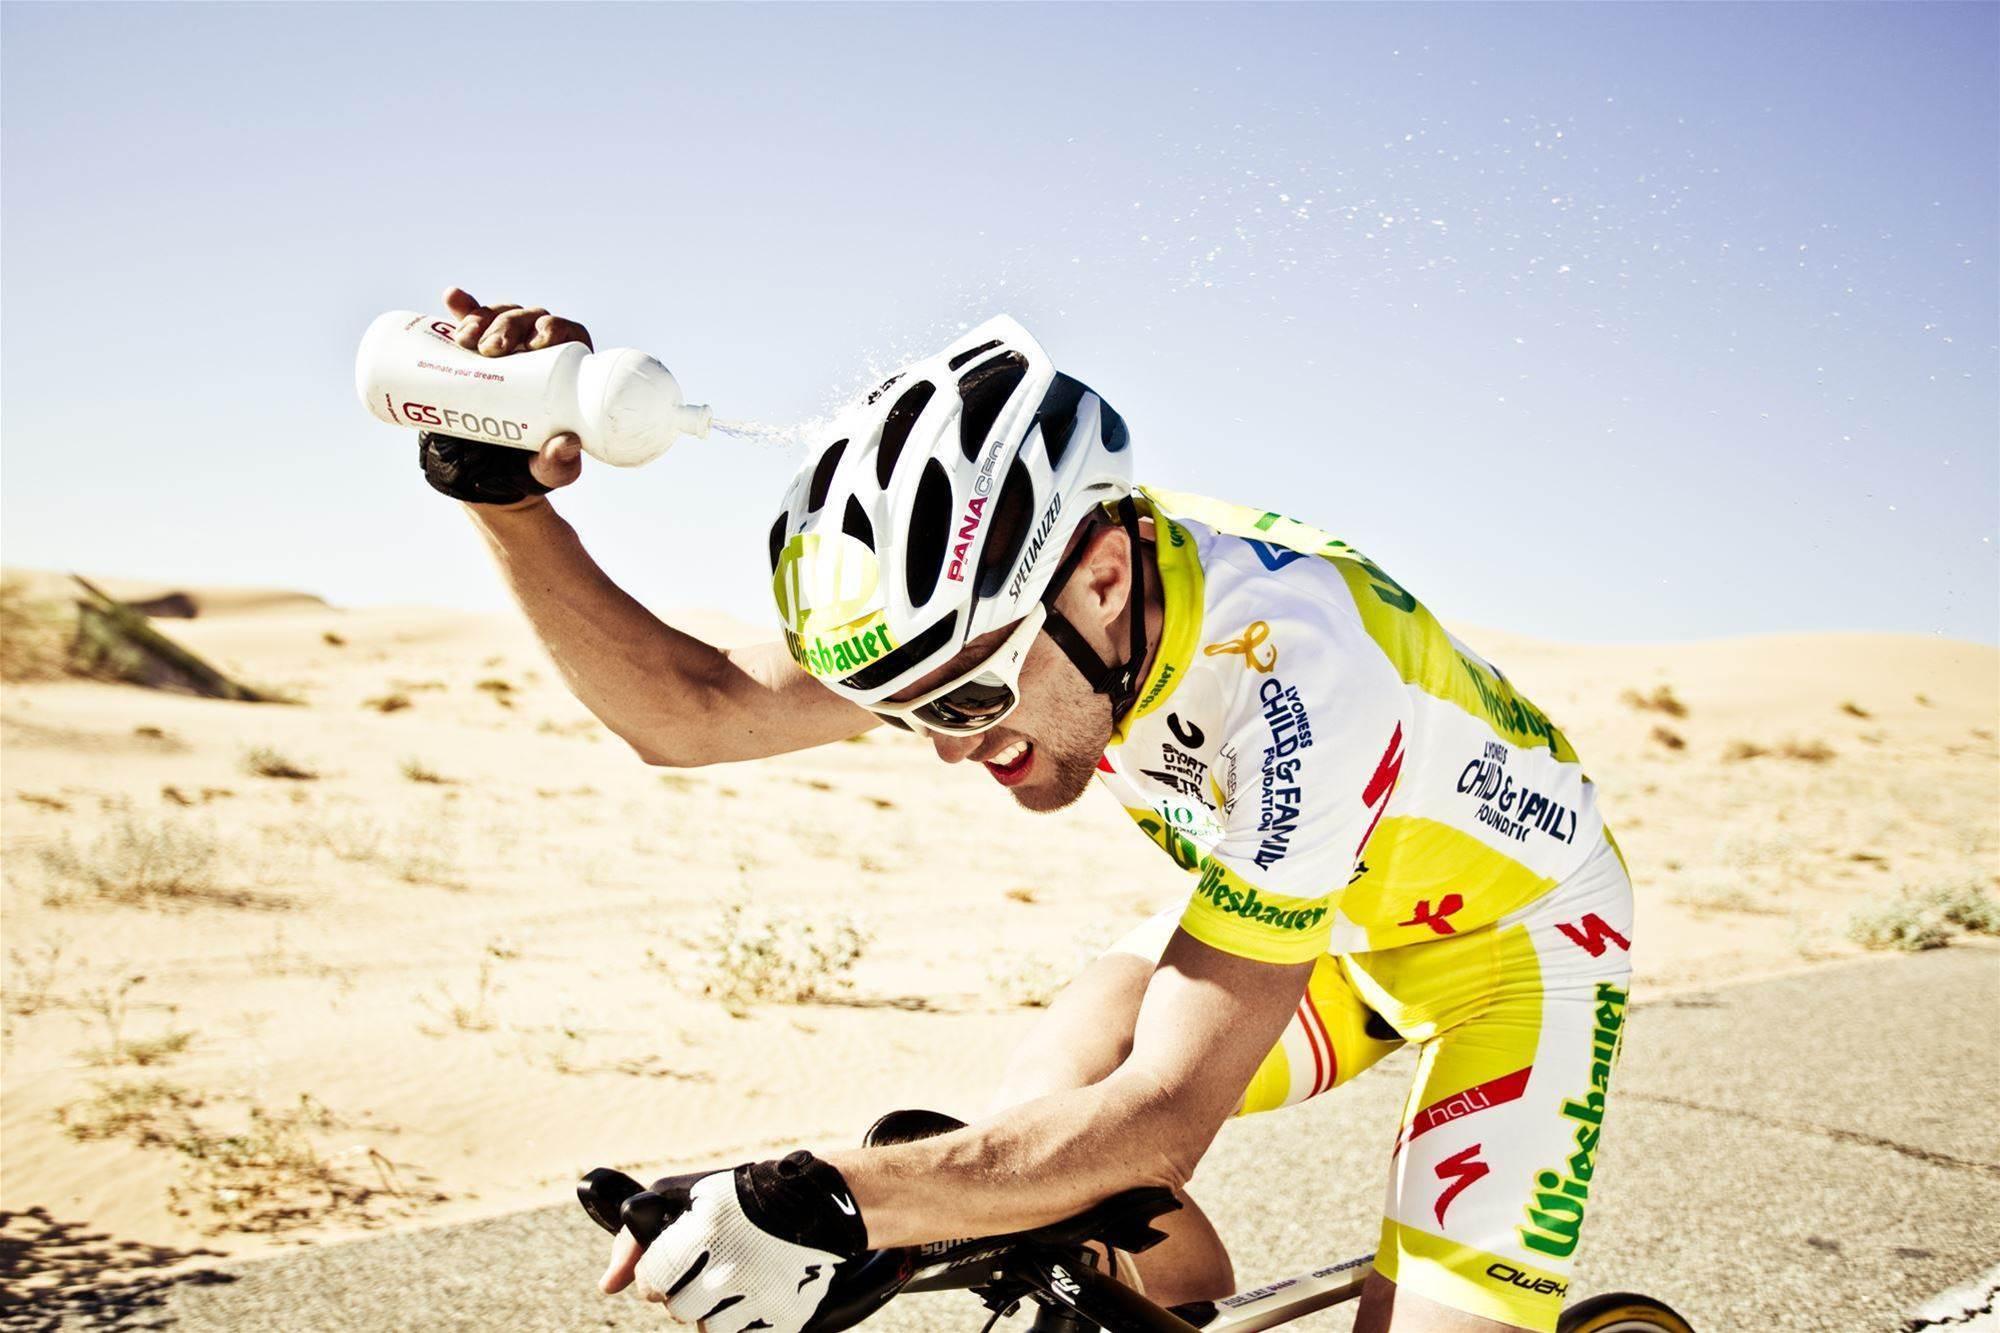 Marathon man rides halfway across Australia in just three days